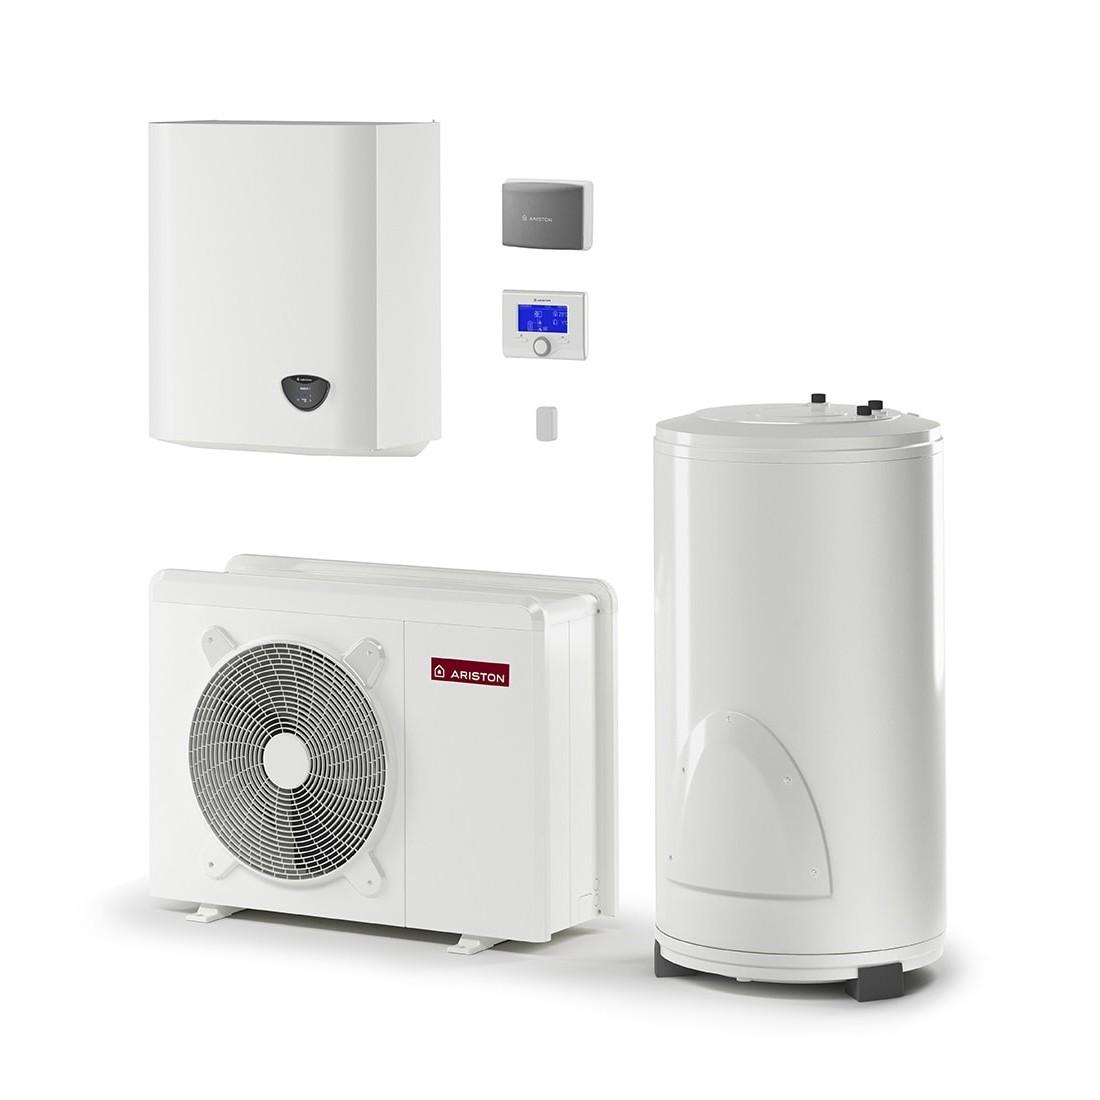 Šilumos siurblys Oras-Vanduo Ariston Nimbus, Flex, 70 S T Net 11 kW Φ3, su 180 (177 l) vandens šildytuvu ir Wi-Fi